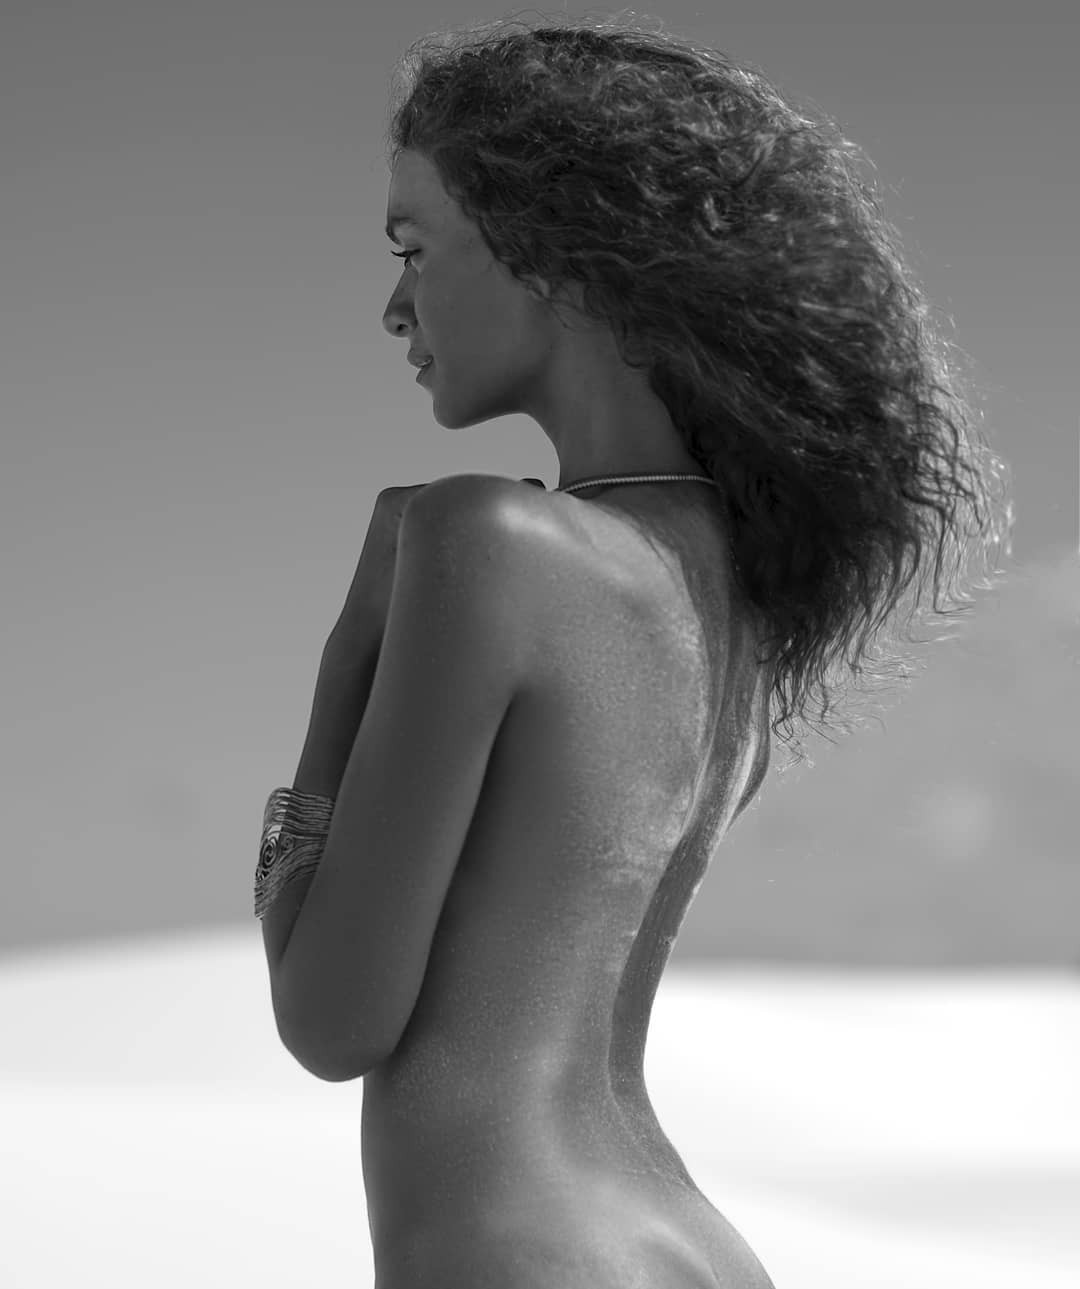 Amanda Chrishell Bikini Pics, Long Legs